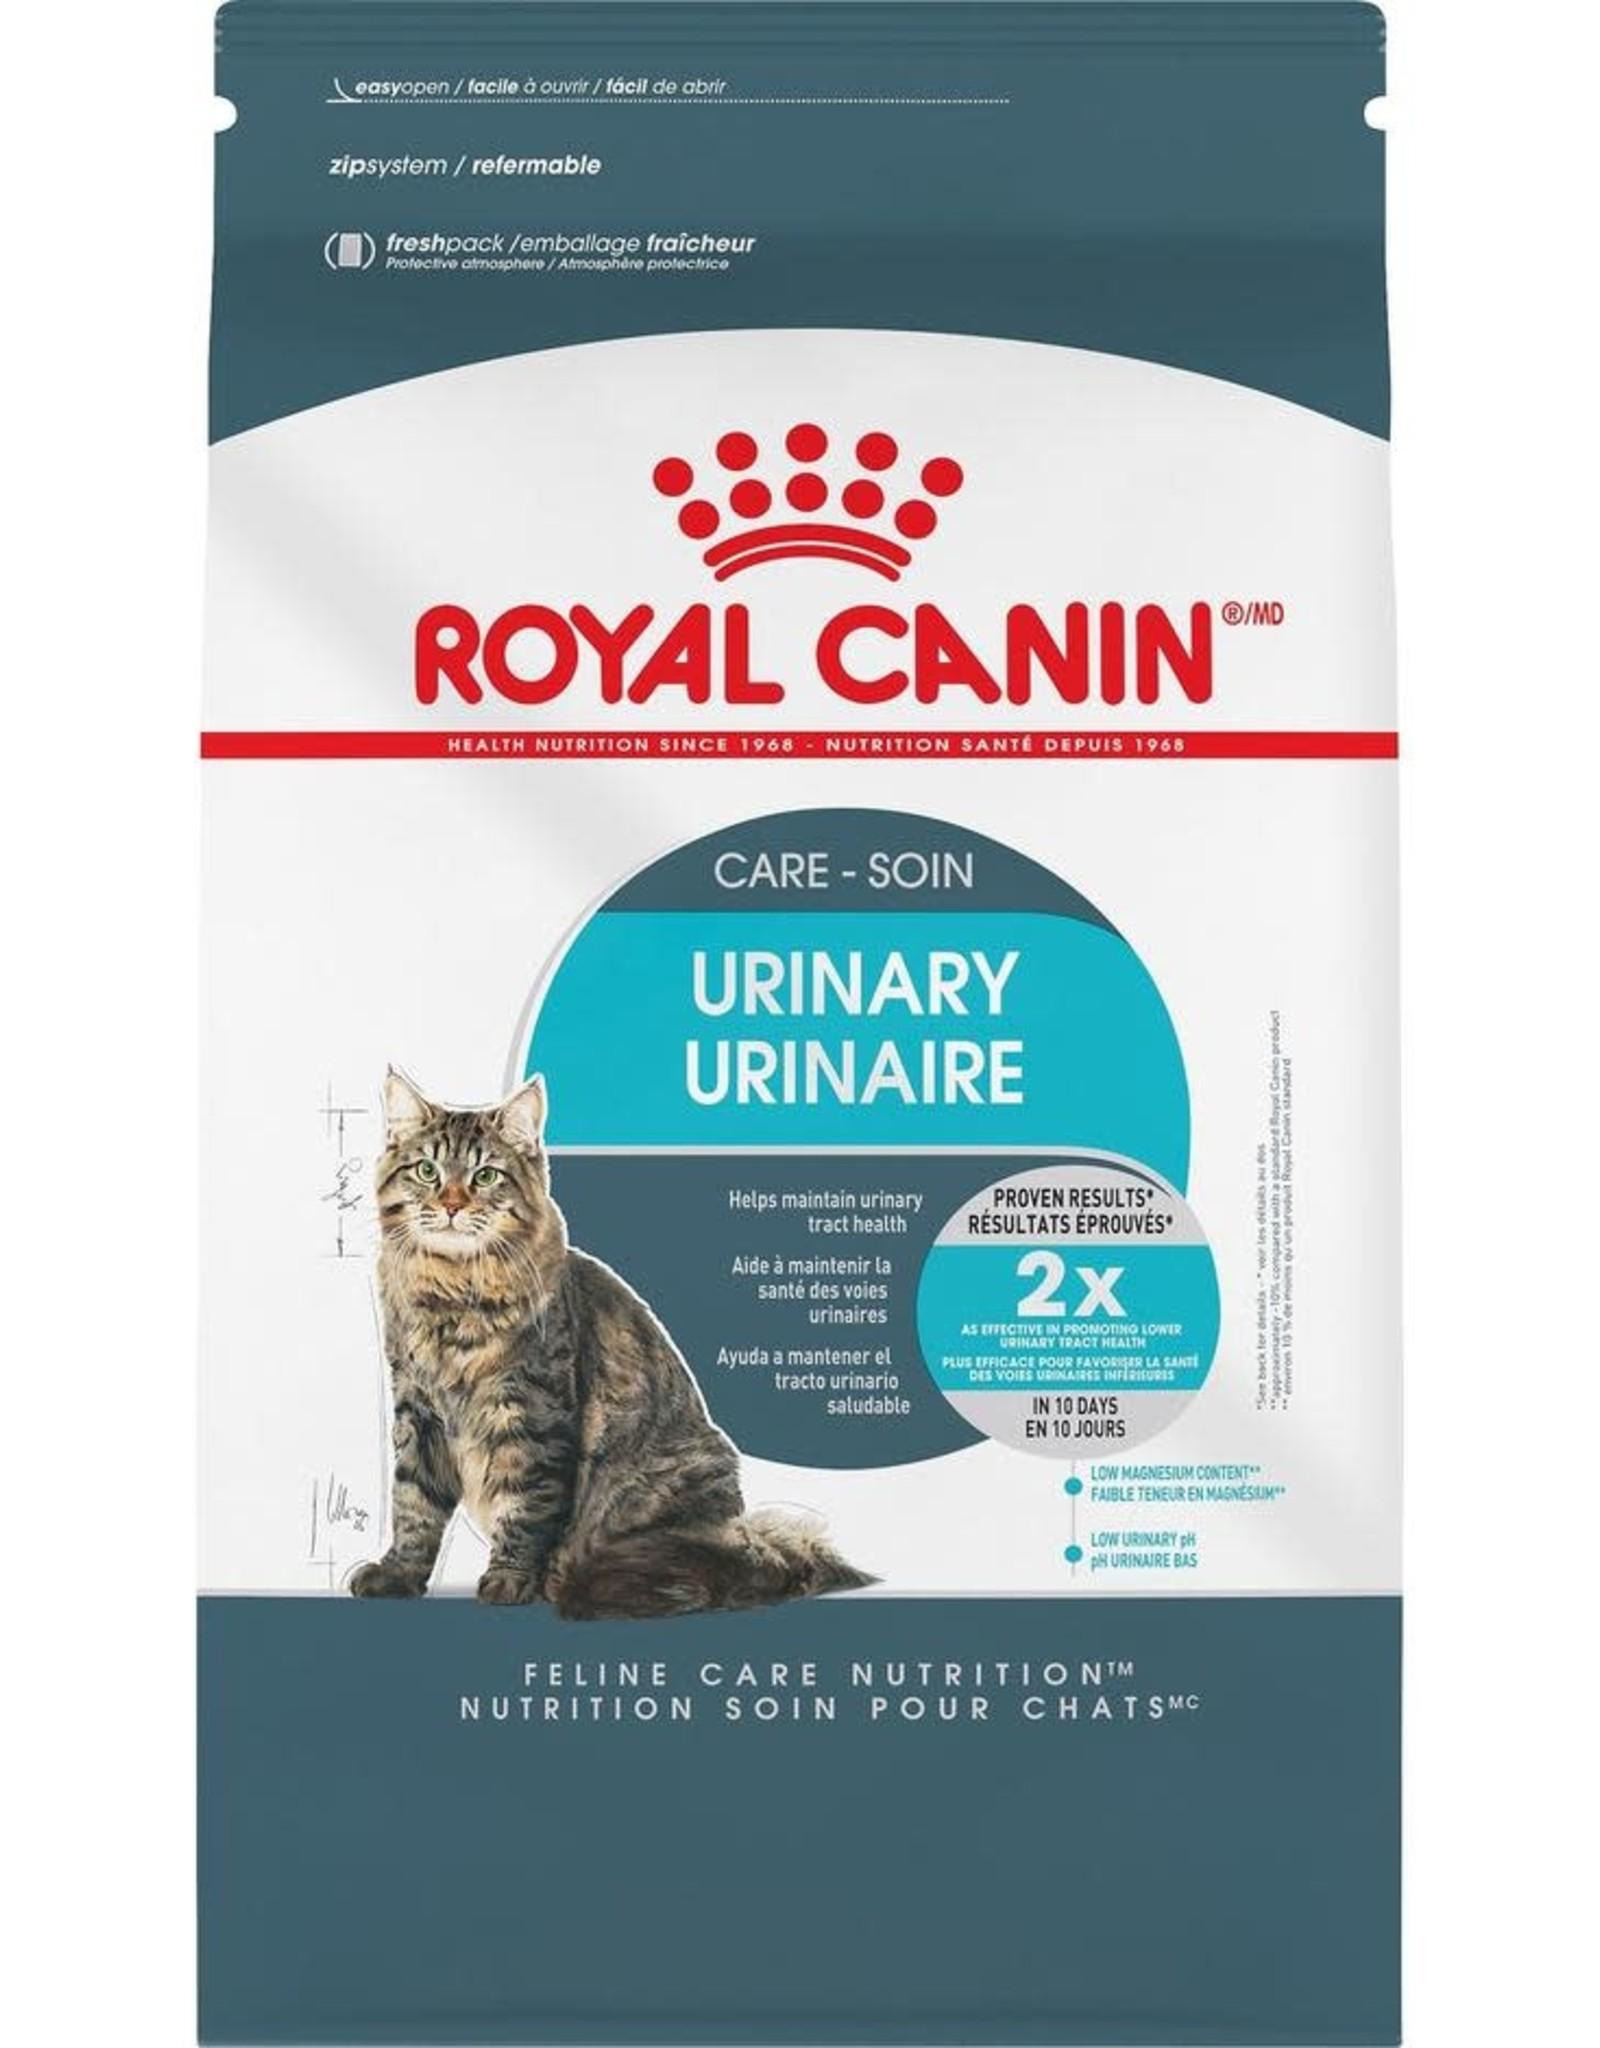 Royal Canin Royal Canin Cat Urinary Care 14lb